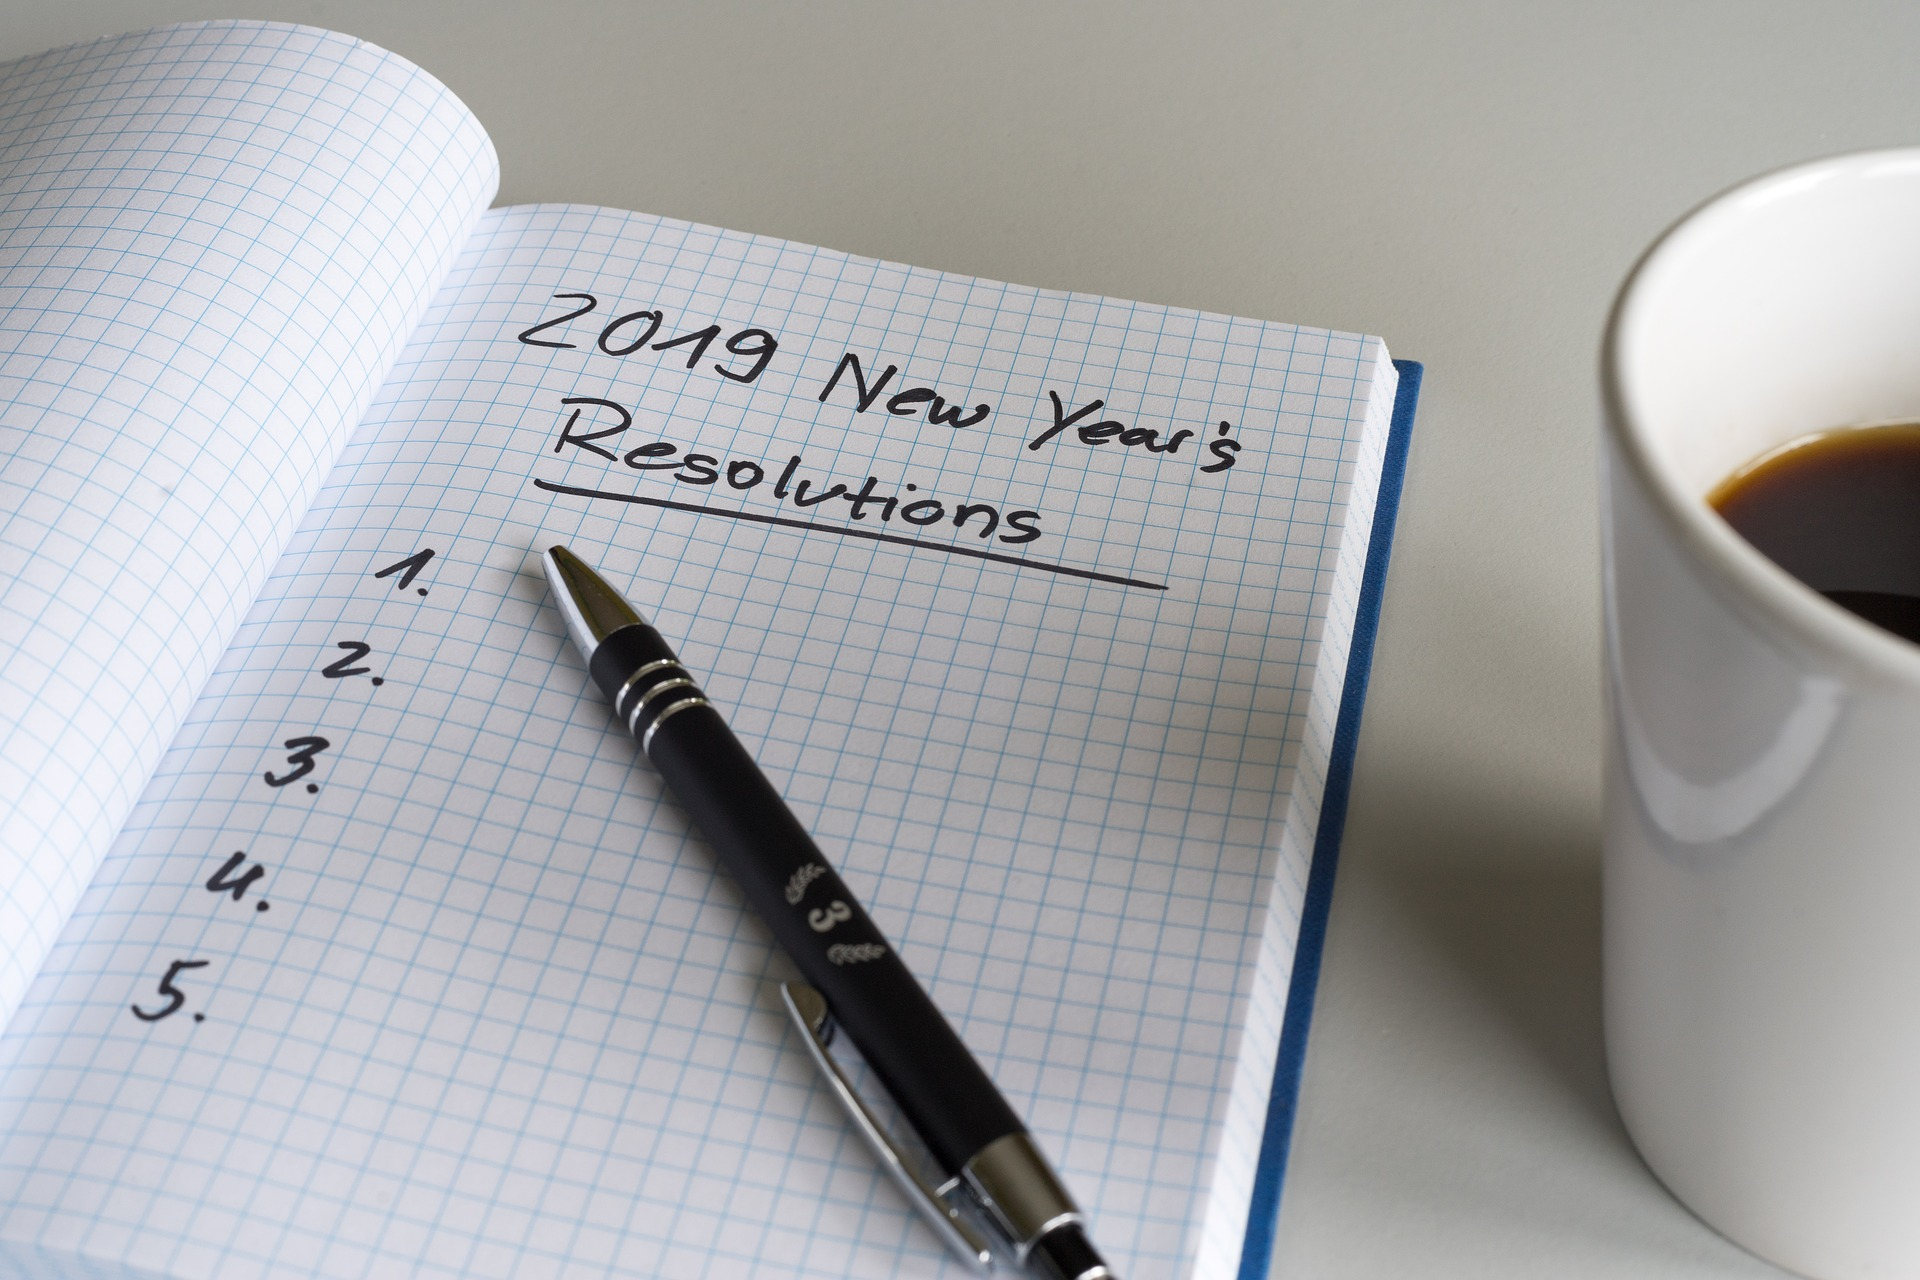 rezolutii anul nou - sfatulparintilor.ro - pixabay-com - resolutions-3889989_1920